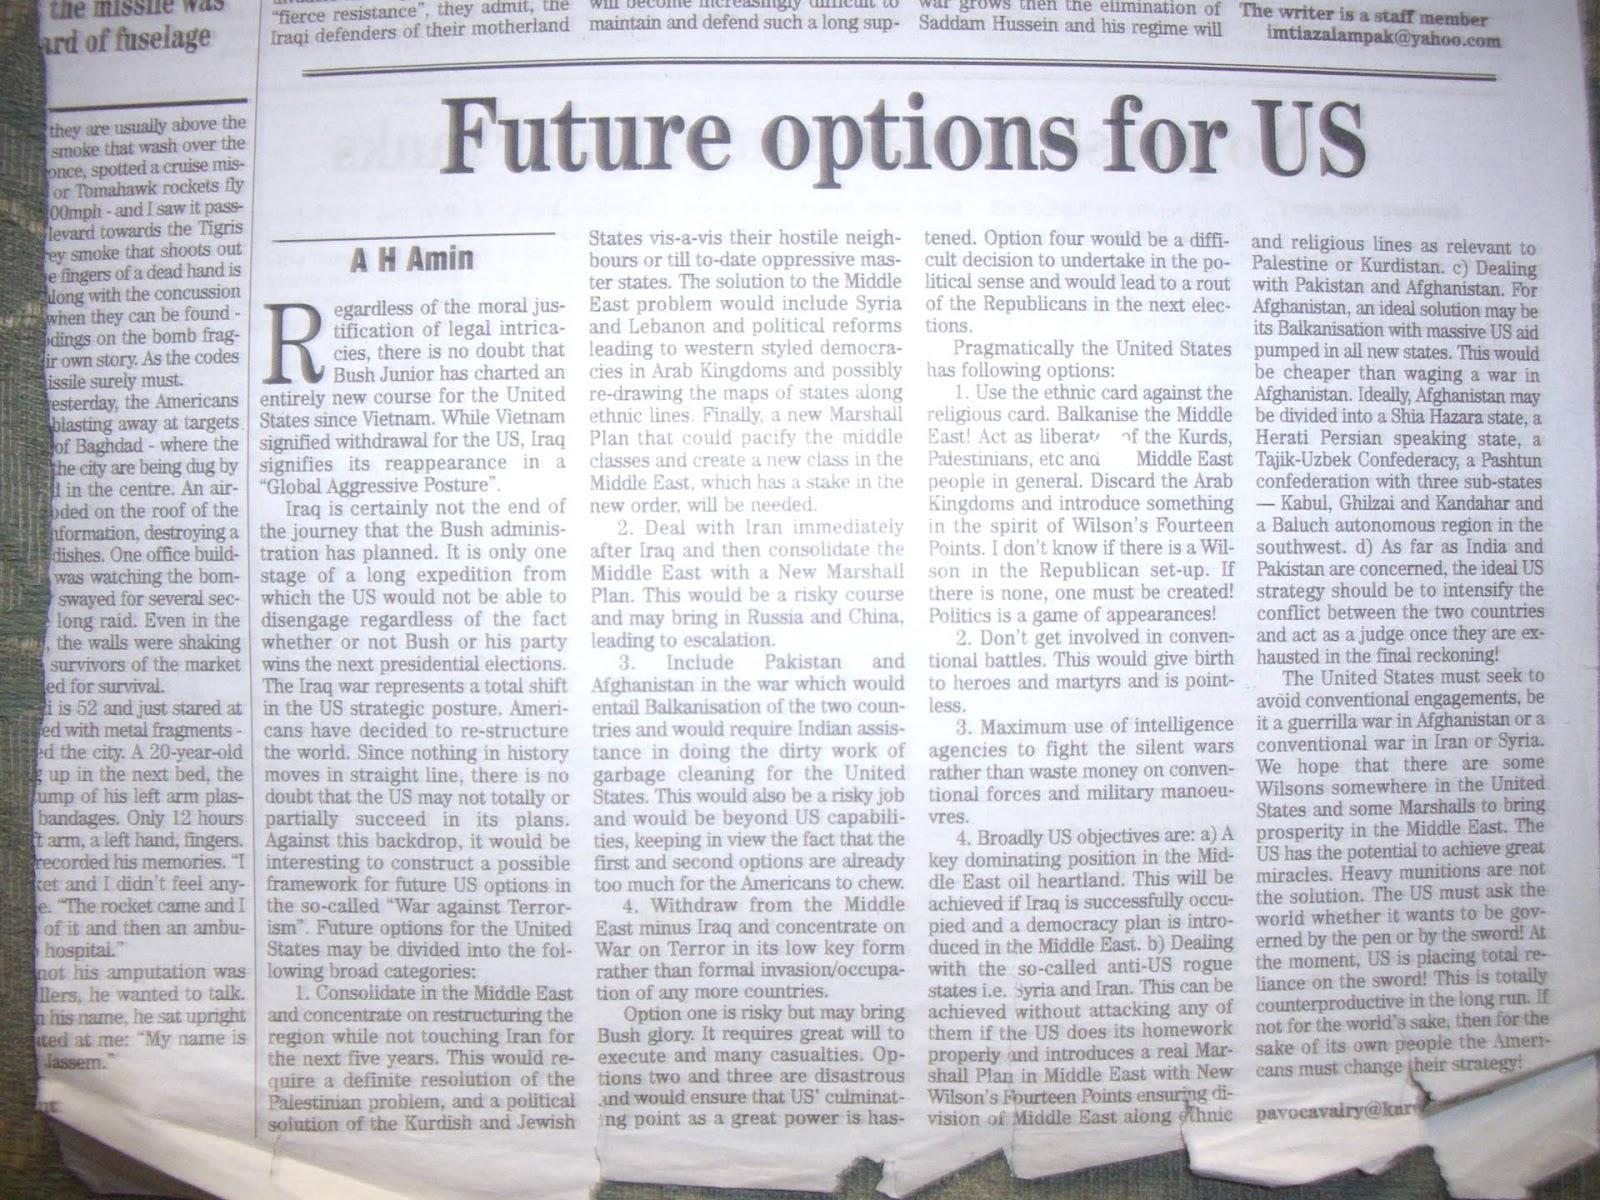 http://4.bp.blogspot.com/-hAeoKrvA6zs/UBFH37TxReI/AAAAAAAAvAc/YQZ2uuNlkFY/s1600/US+Options-2003.jpg